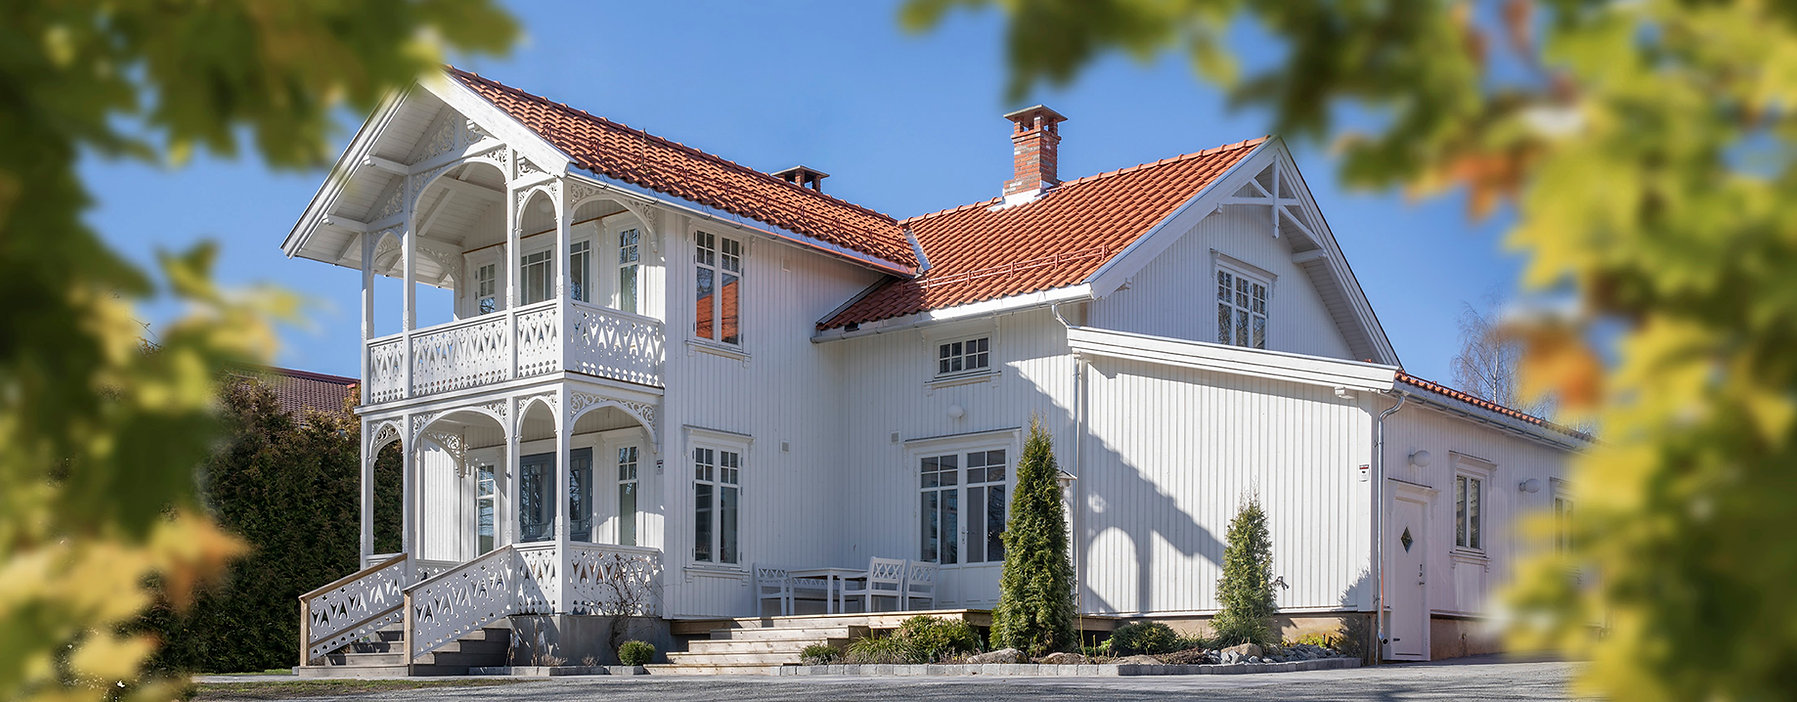 Sveitser hus med detaljer fra Faktortre snekkerverksted